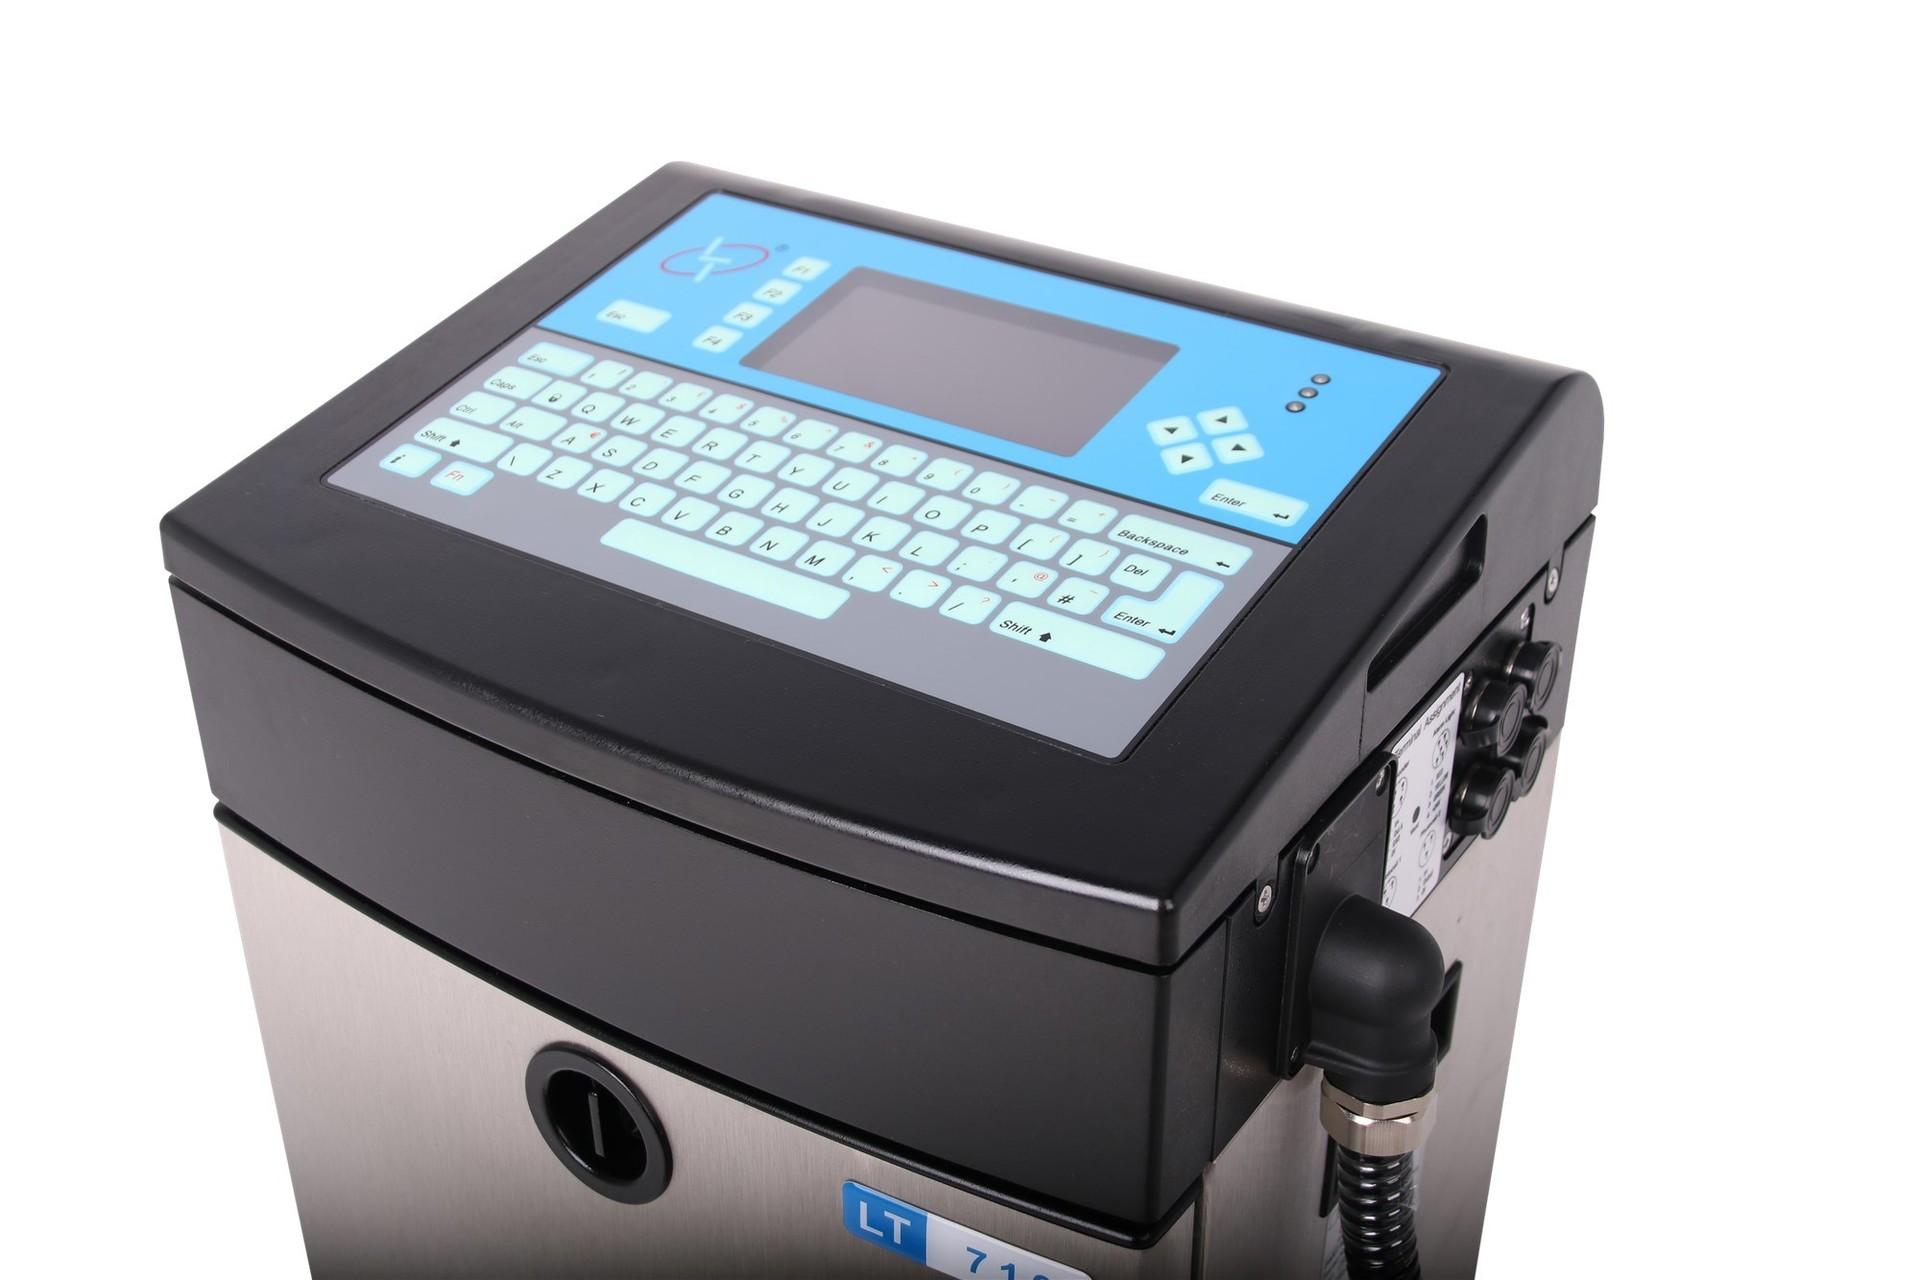 Lead Tech Lt710 Moving Head Printing Continuous Cij Inkjet Printer